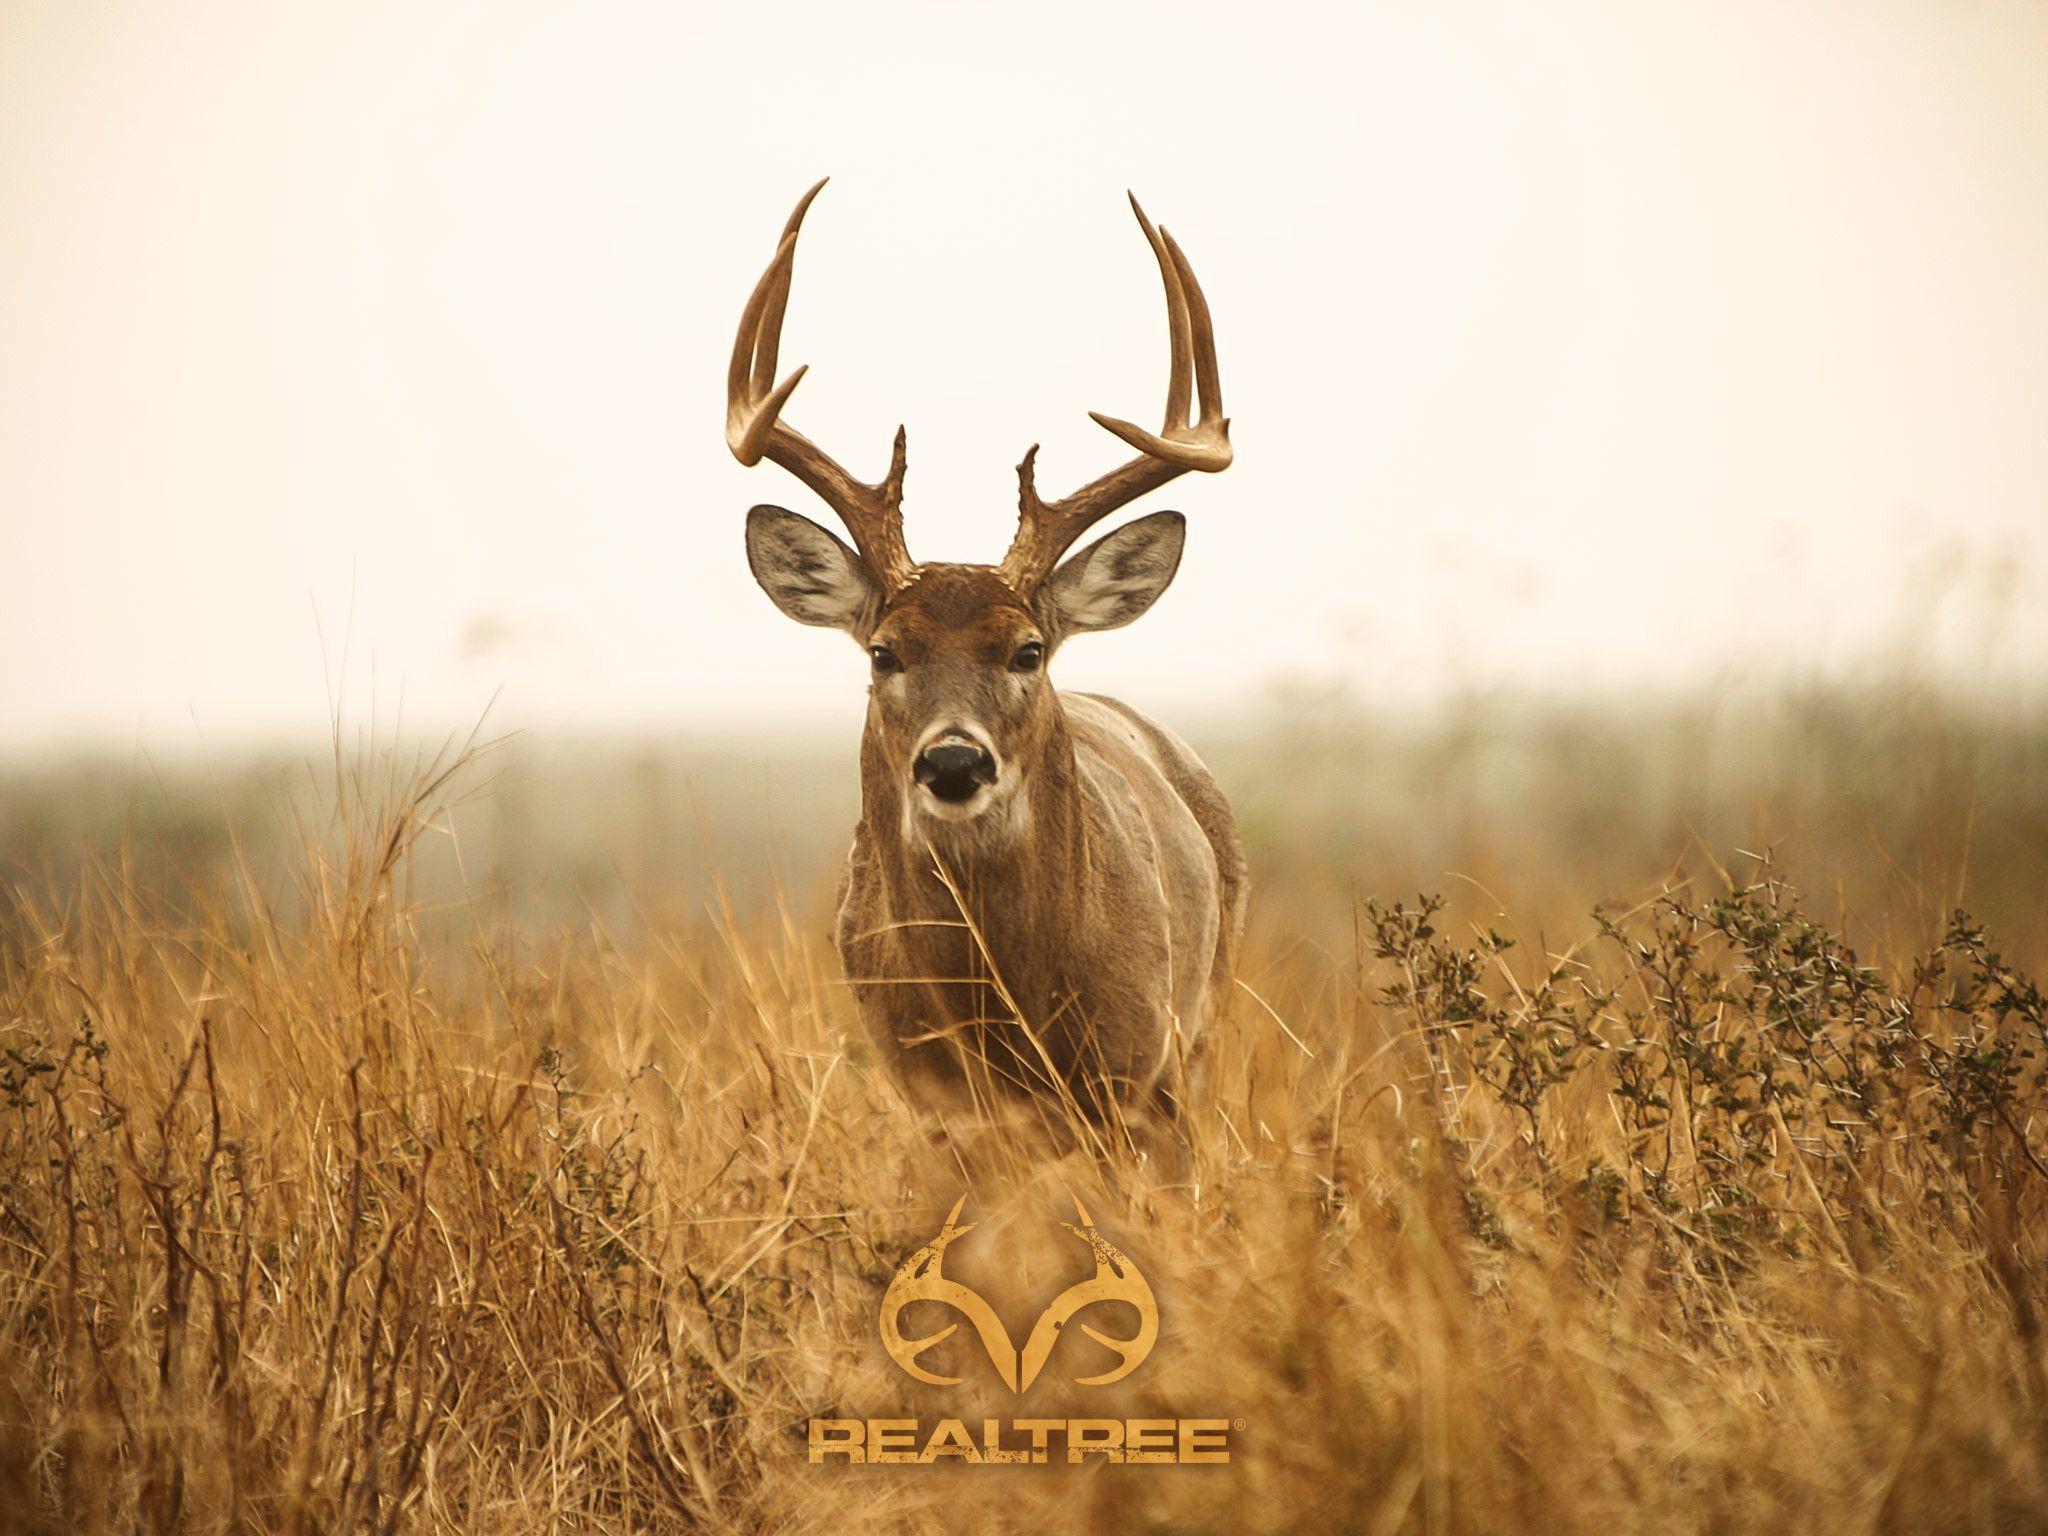 Big Whitetail Buck Wallpaper 56 images Hunting wallpaper Deer 2048x1536